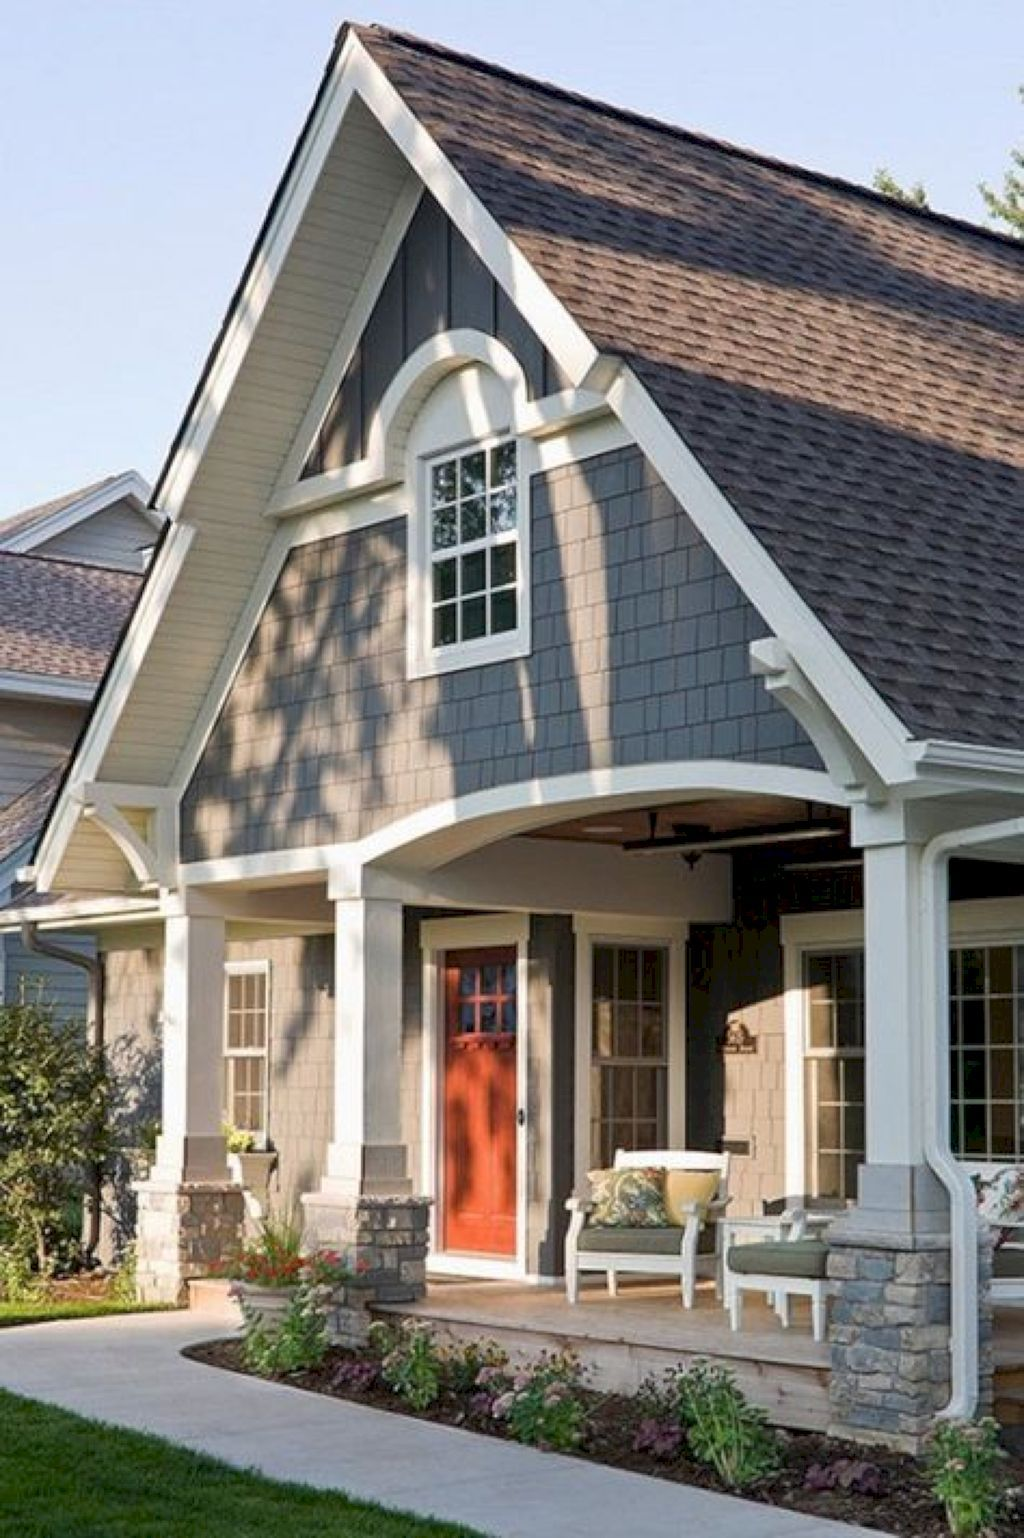 45 Farmhouse Home Exterior Design Ideas   Exterior design ...